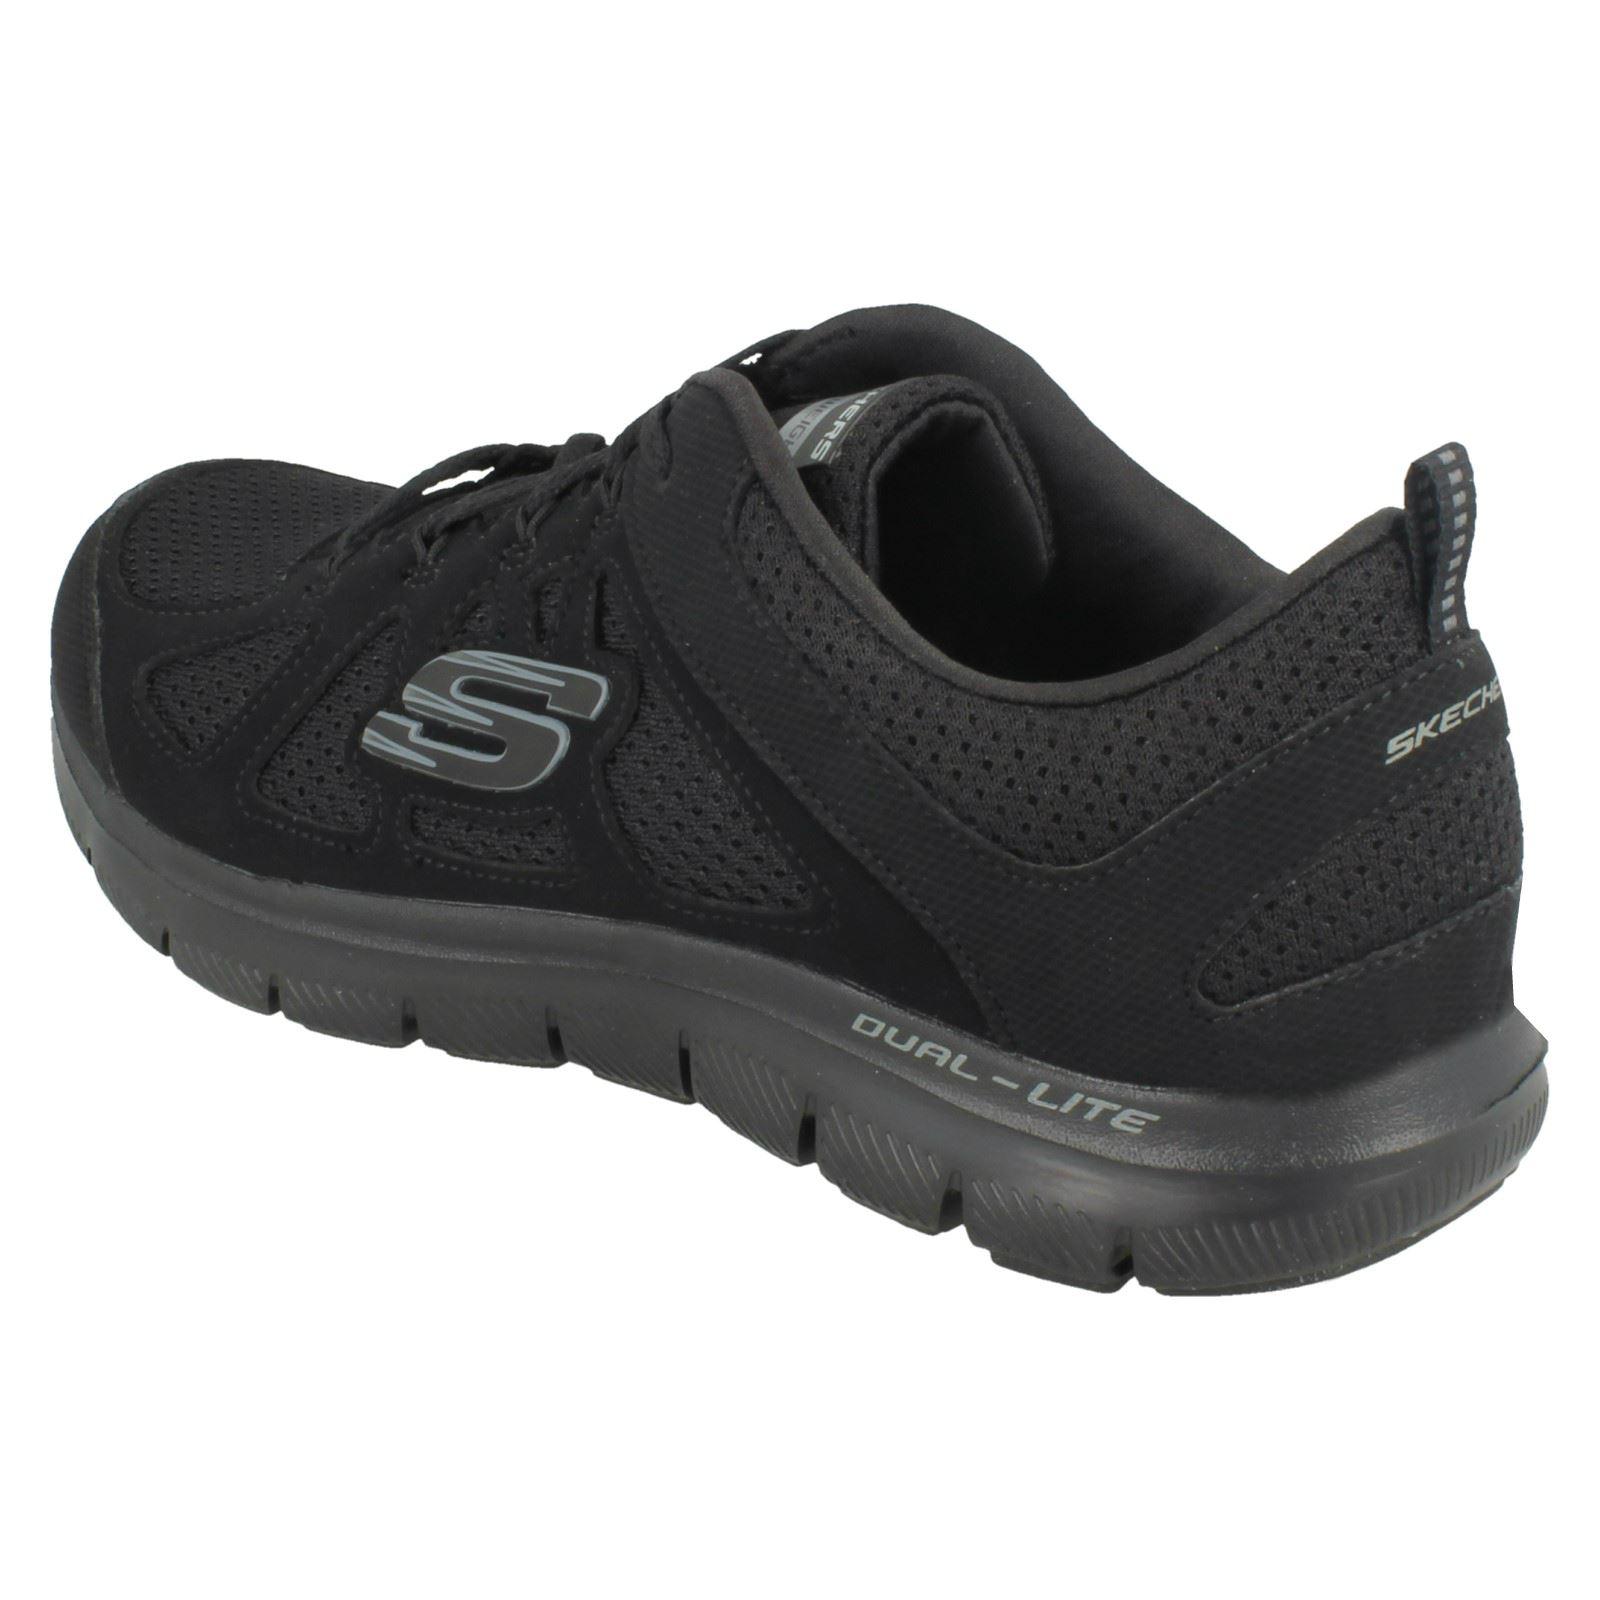 'simplista' oras Negro Skechers Se Entrenadores ngSvzw0Pzq